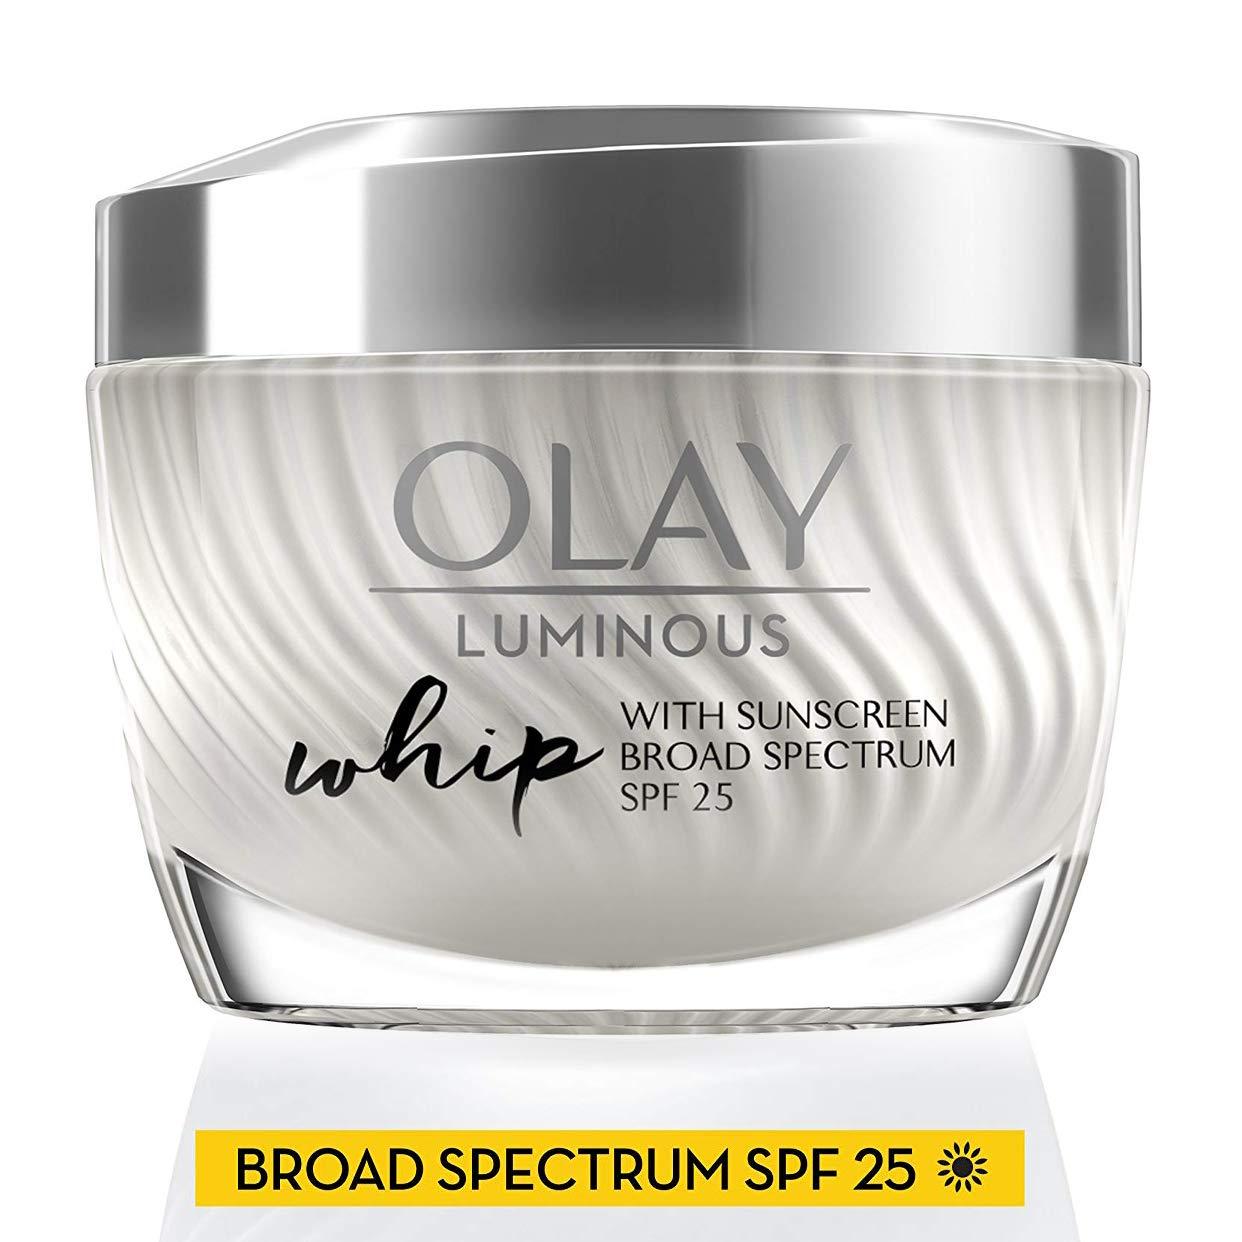 Olay Luminous Whip Light Face Moisturizer SPF 25, Visibly Reduce Dark Spots & Minimize the look of Pores, 1.7 Oz